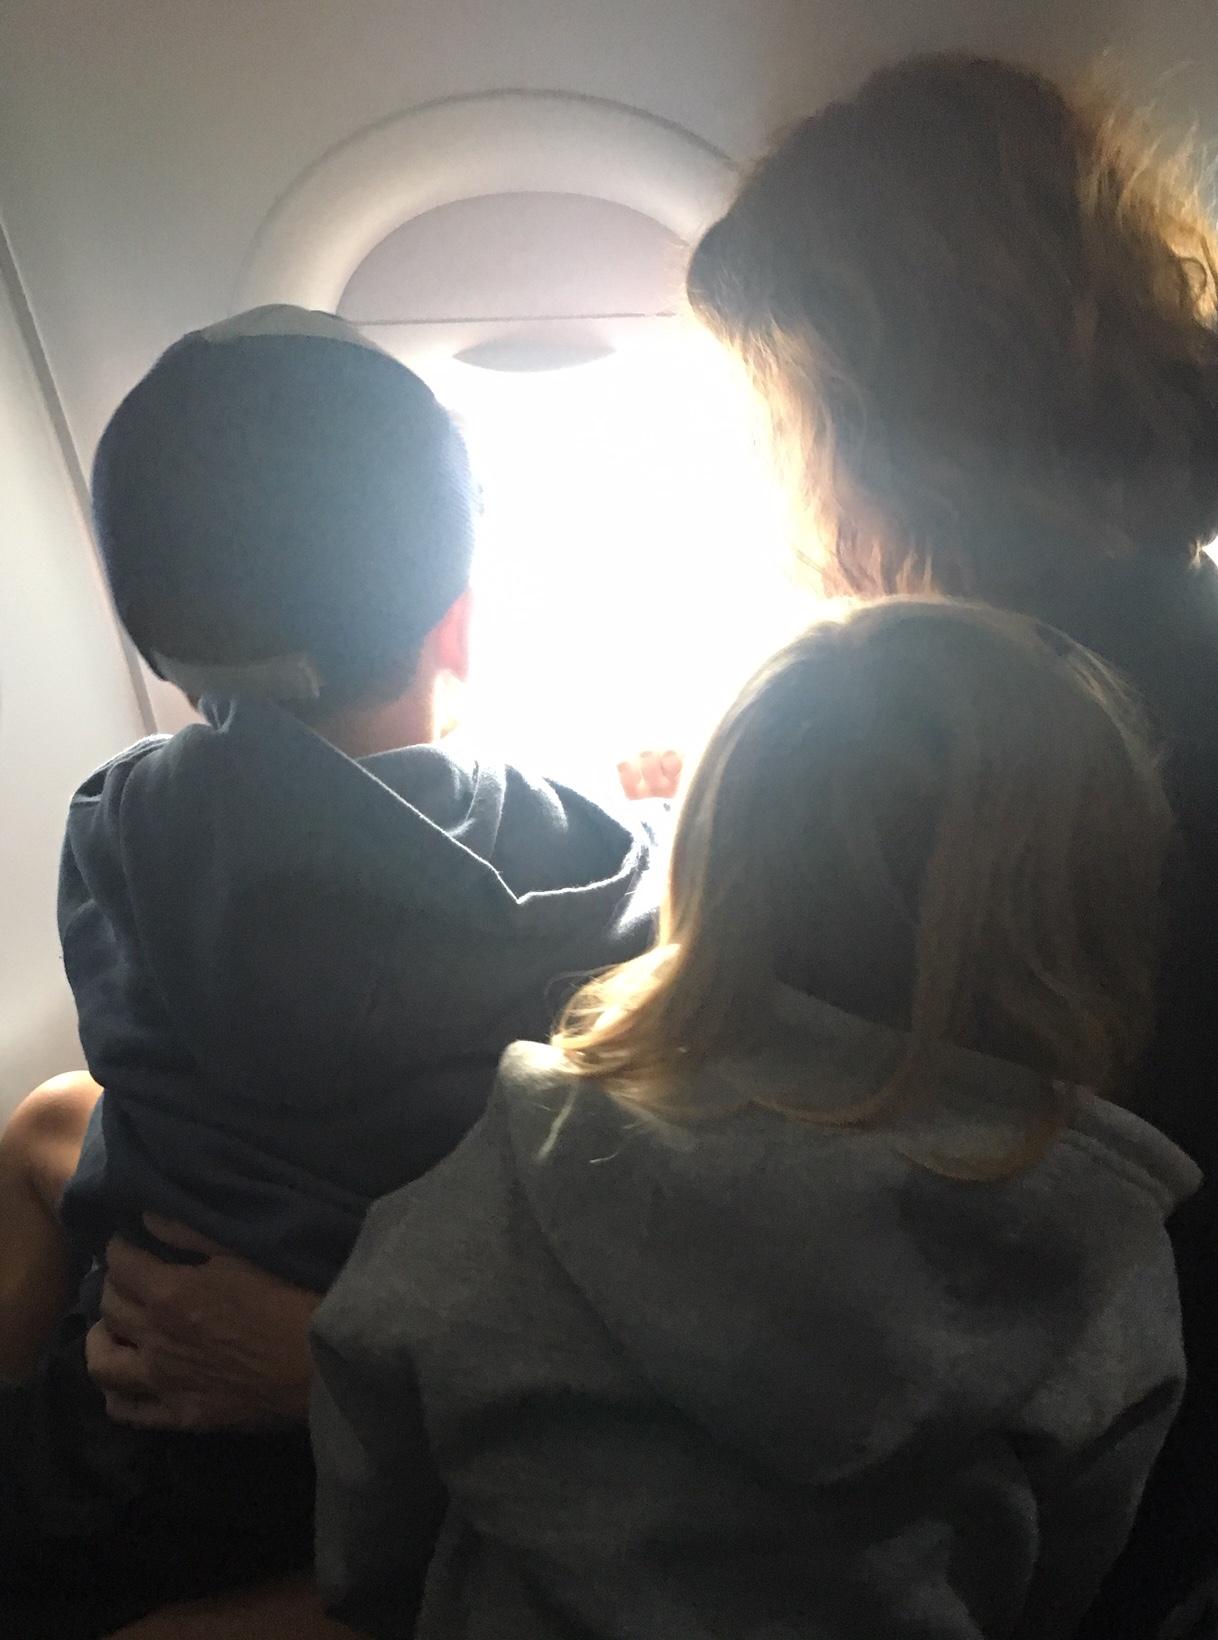 Their first airplane ride!